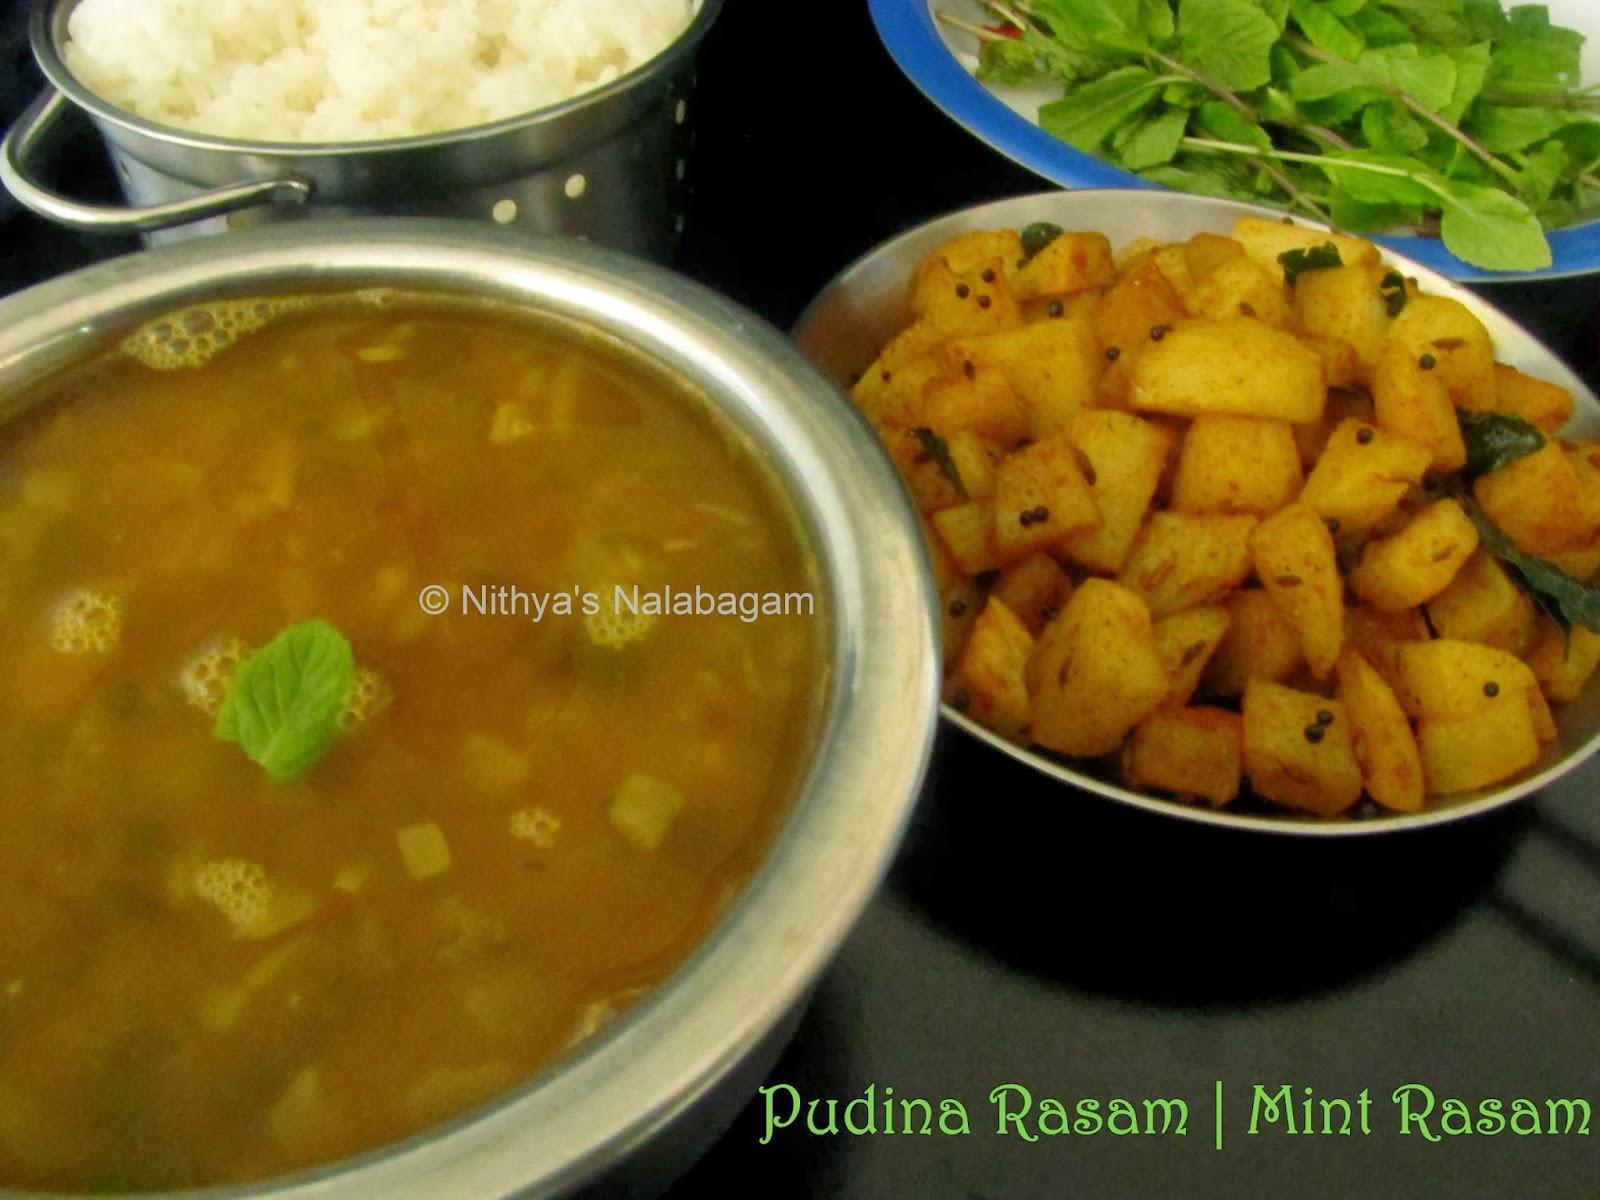 Pudhina Rasam